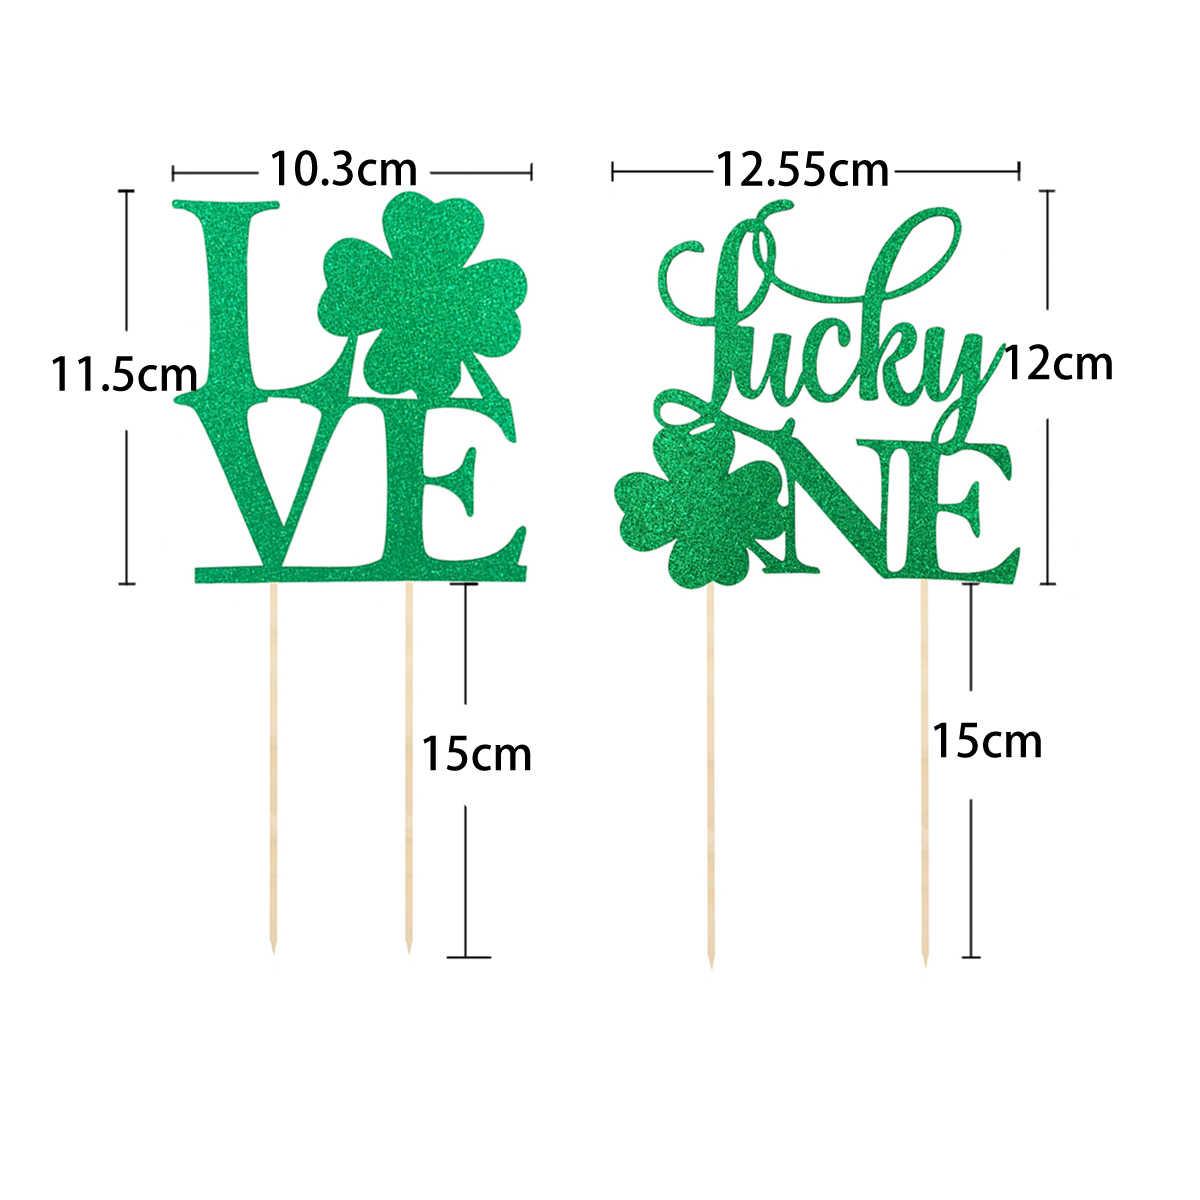 2 Pcs Shamrock Clover Kue Toppers Cupcake Picks Tongkat untuk Lulus St Patricks Hari Perlengkapan Pesta Dessert Table A30